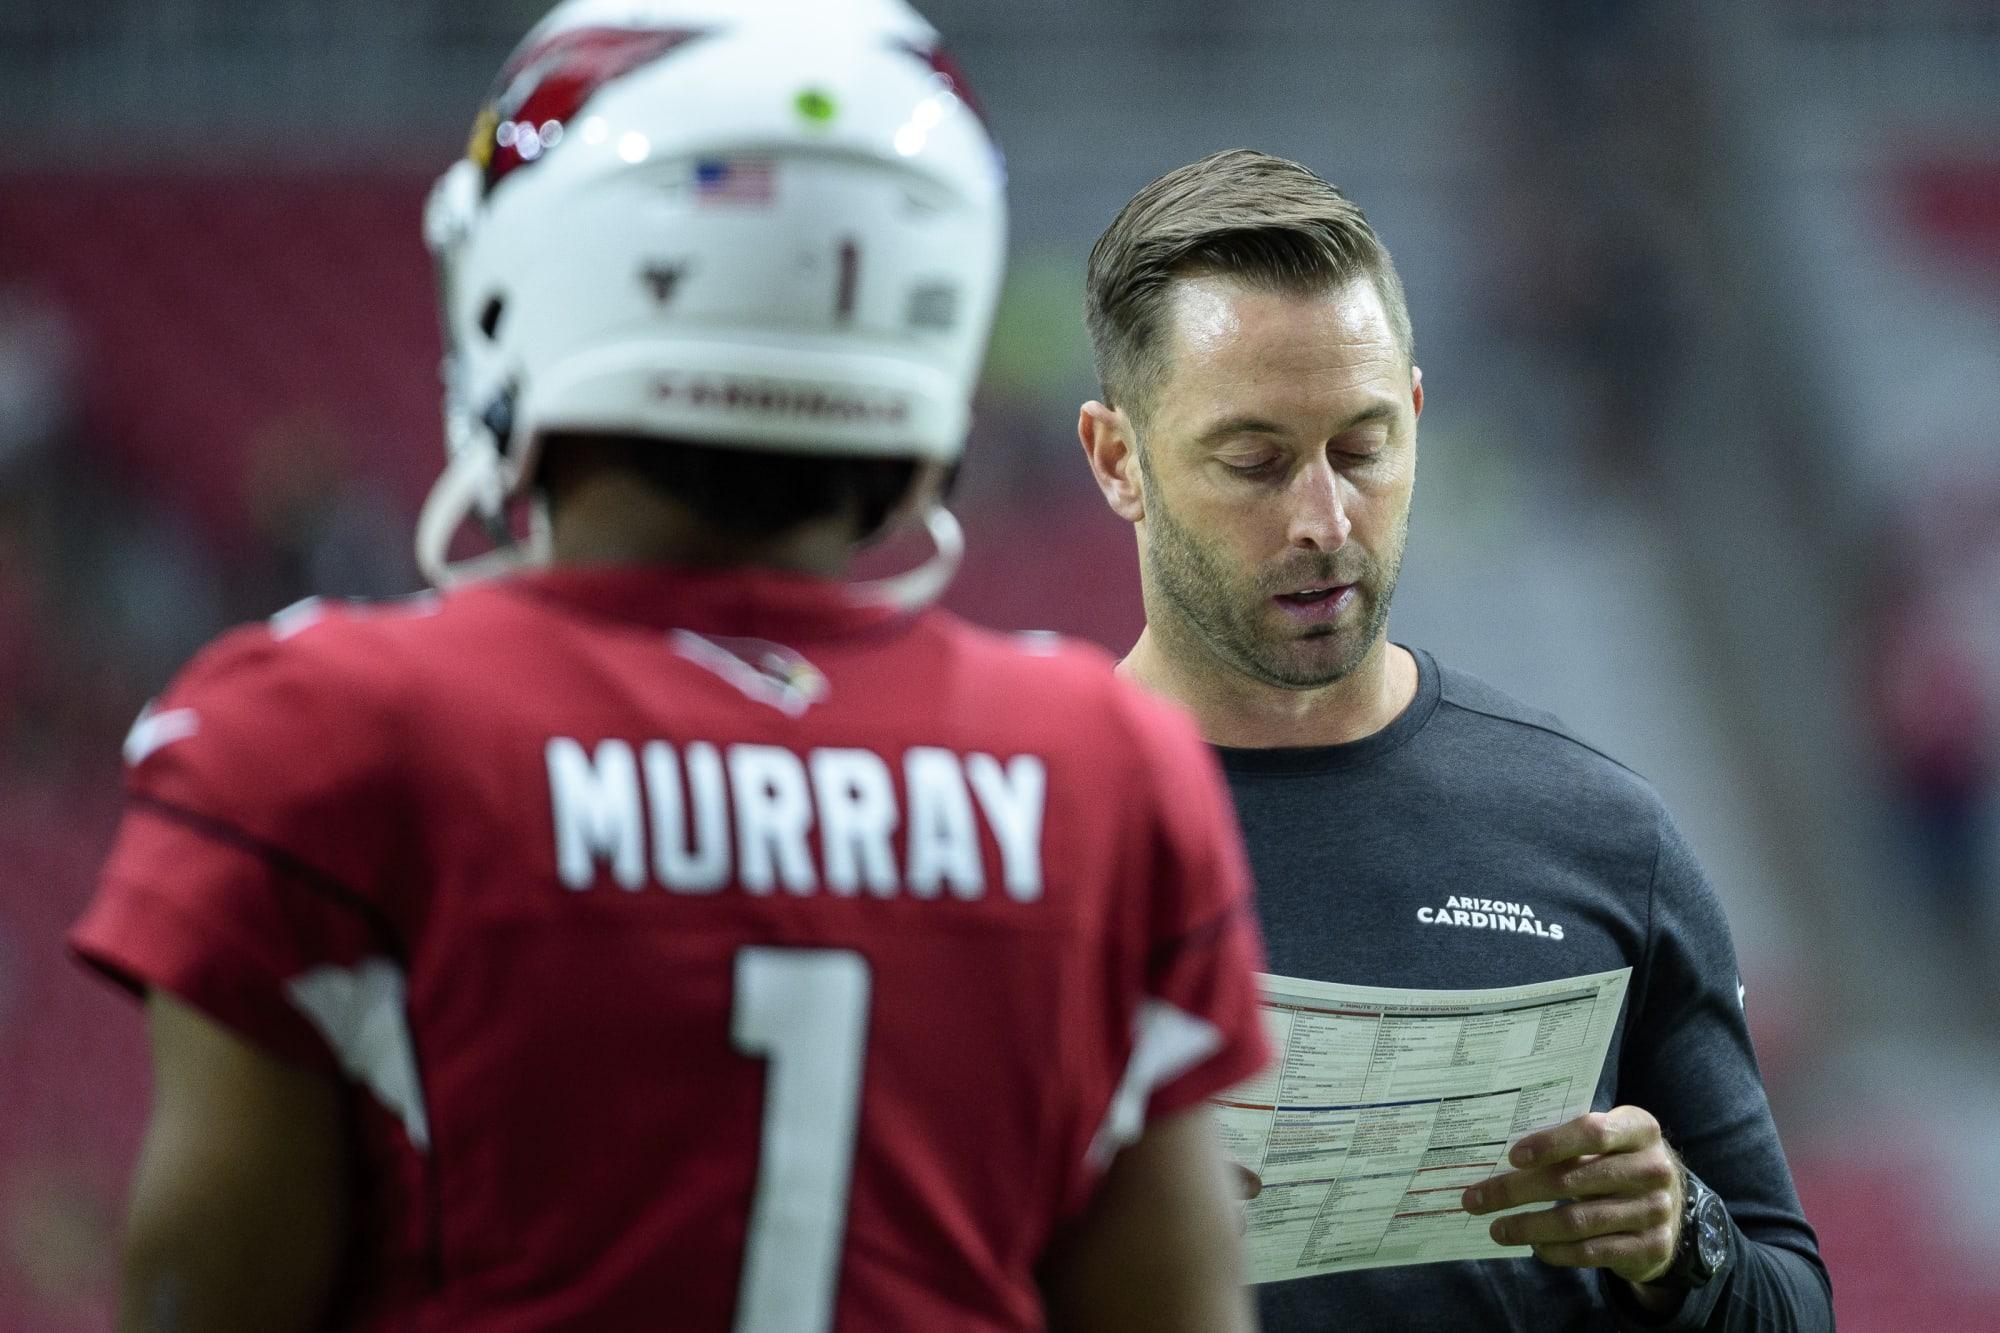 2021 NFL Draft: Arizona Cardinals 7-Round Mock Draft